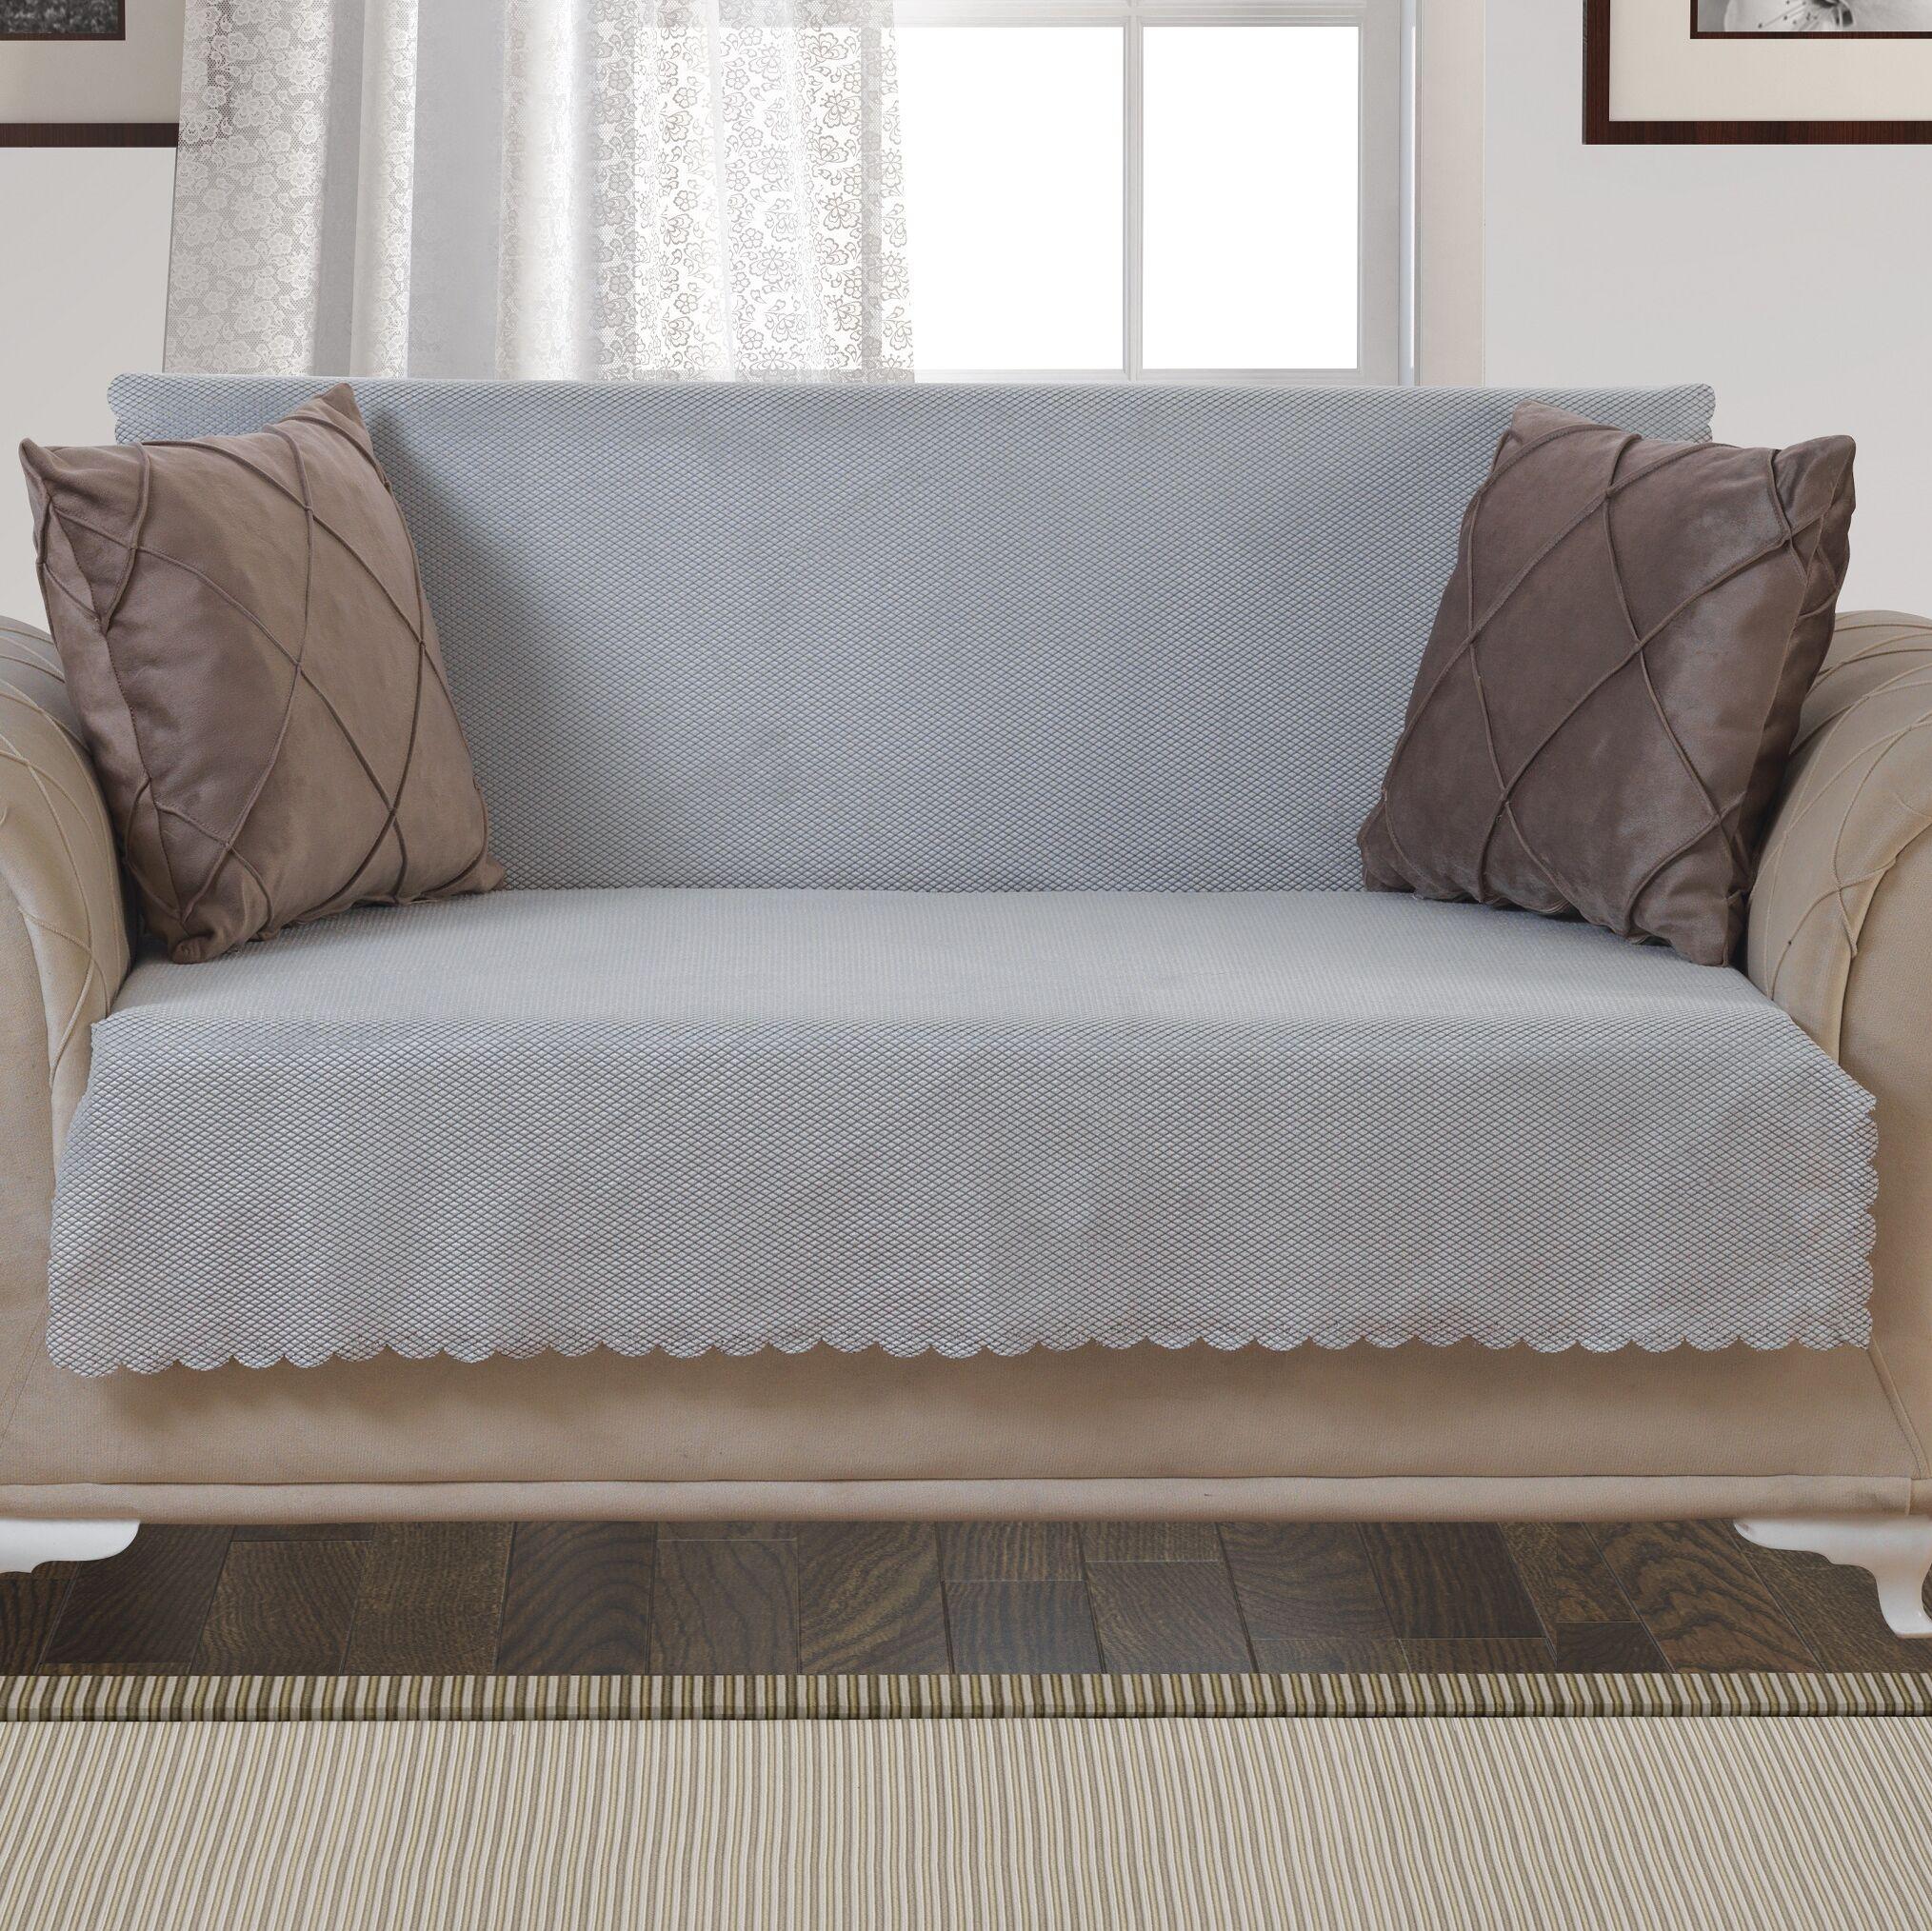 Pet Protector T-Cushion Loveseat Slipcover Upholstery: Light Gray